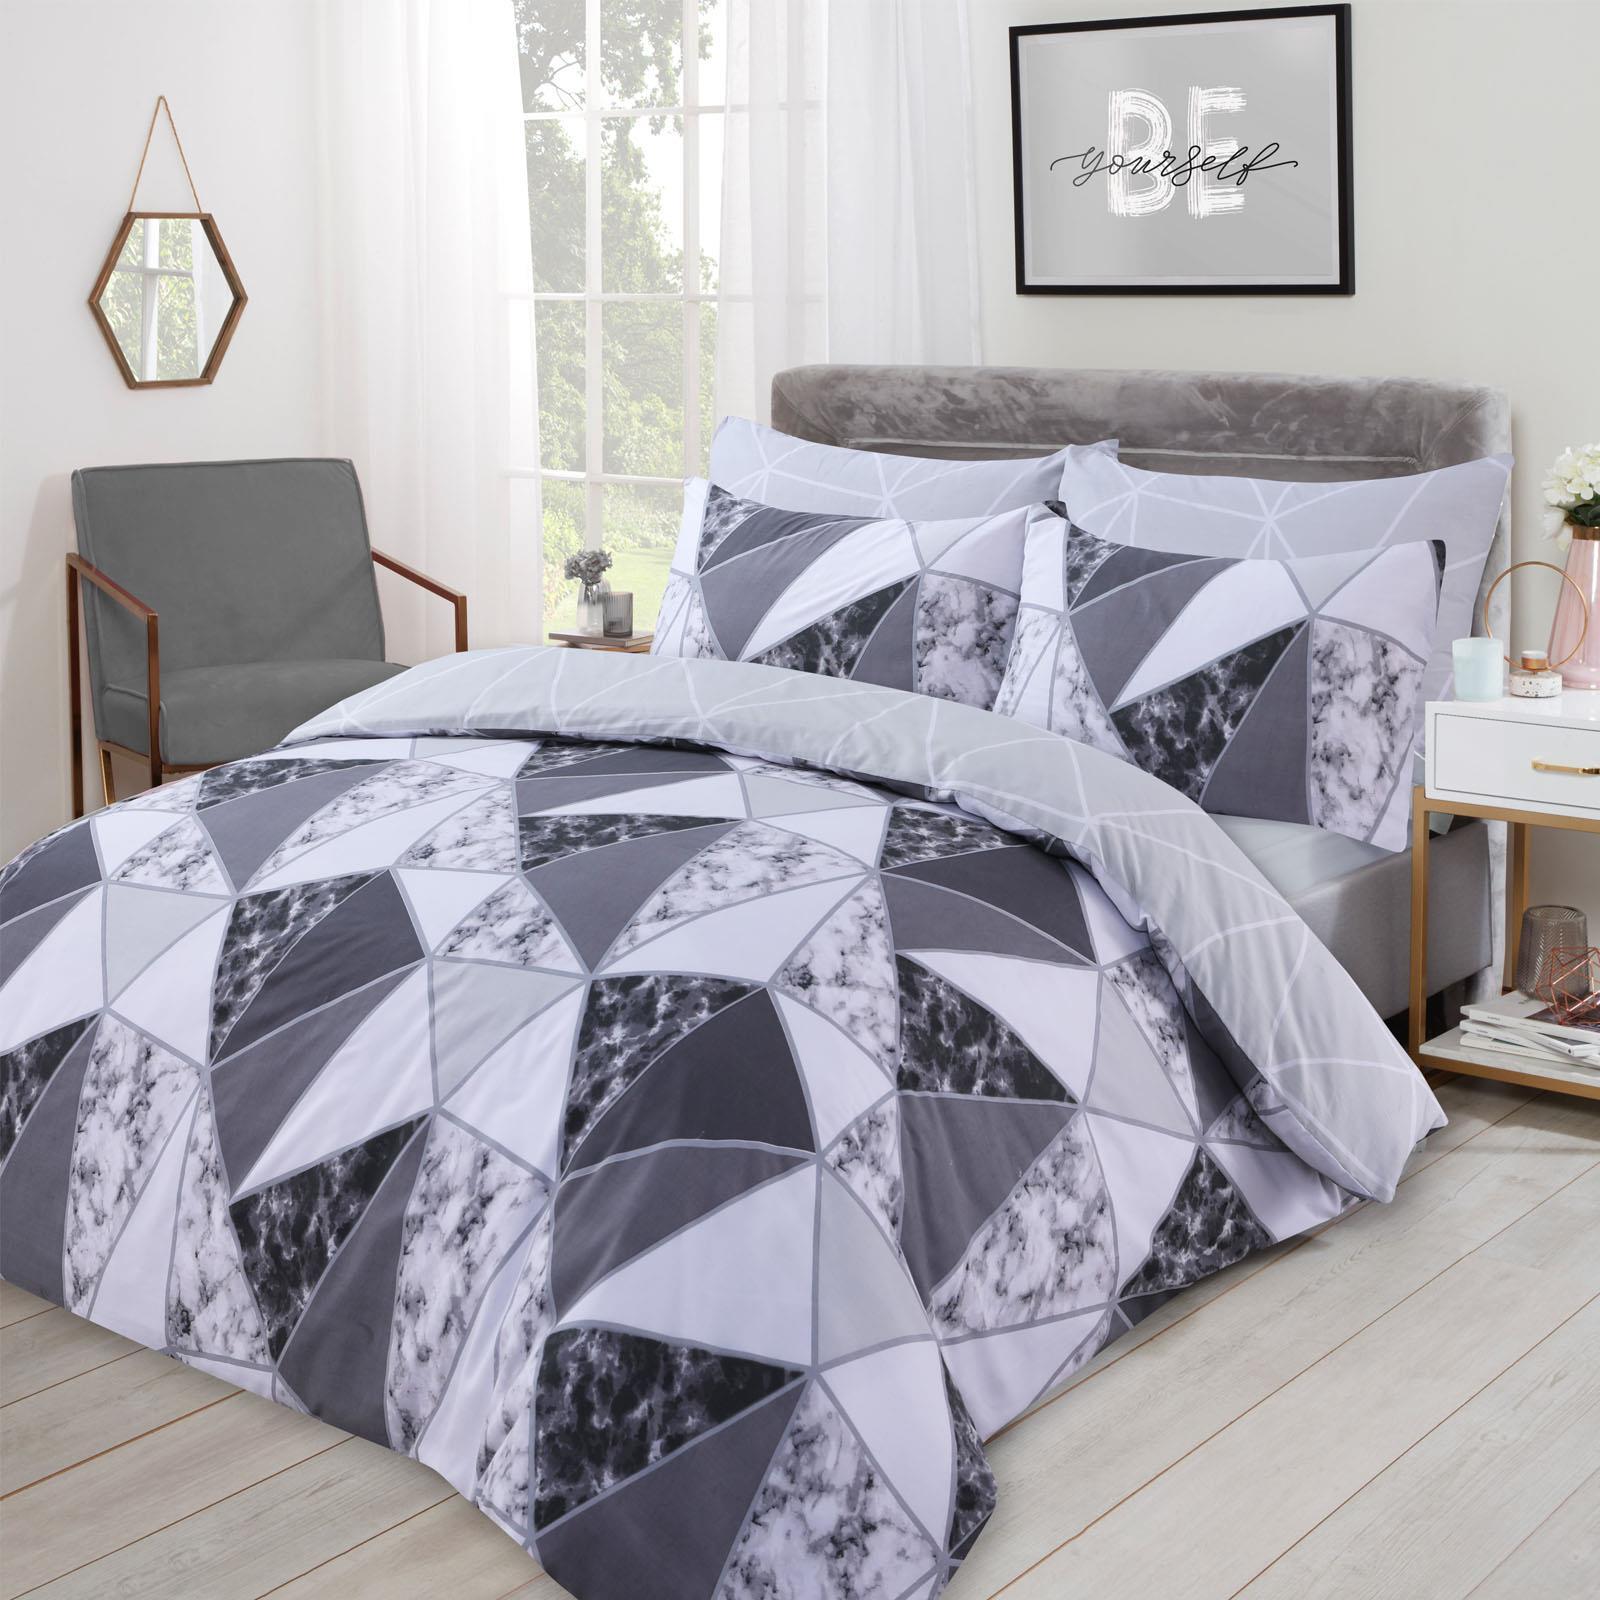 thumbnail 17 - Dreamscene Marble Geometric Duvet Cover with Pillowcase Bedding Set Grey Blush